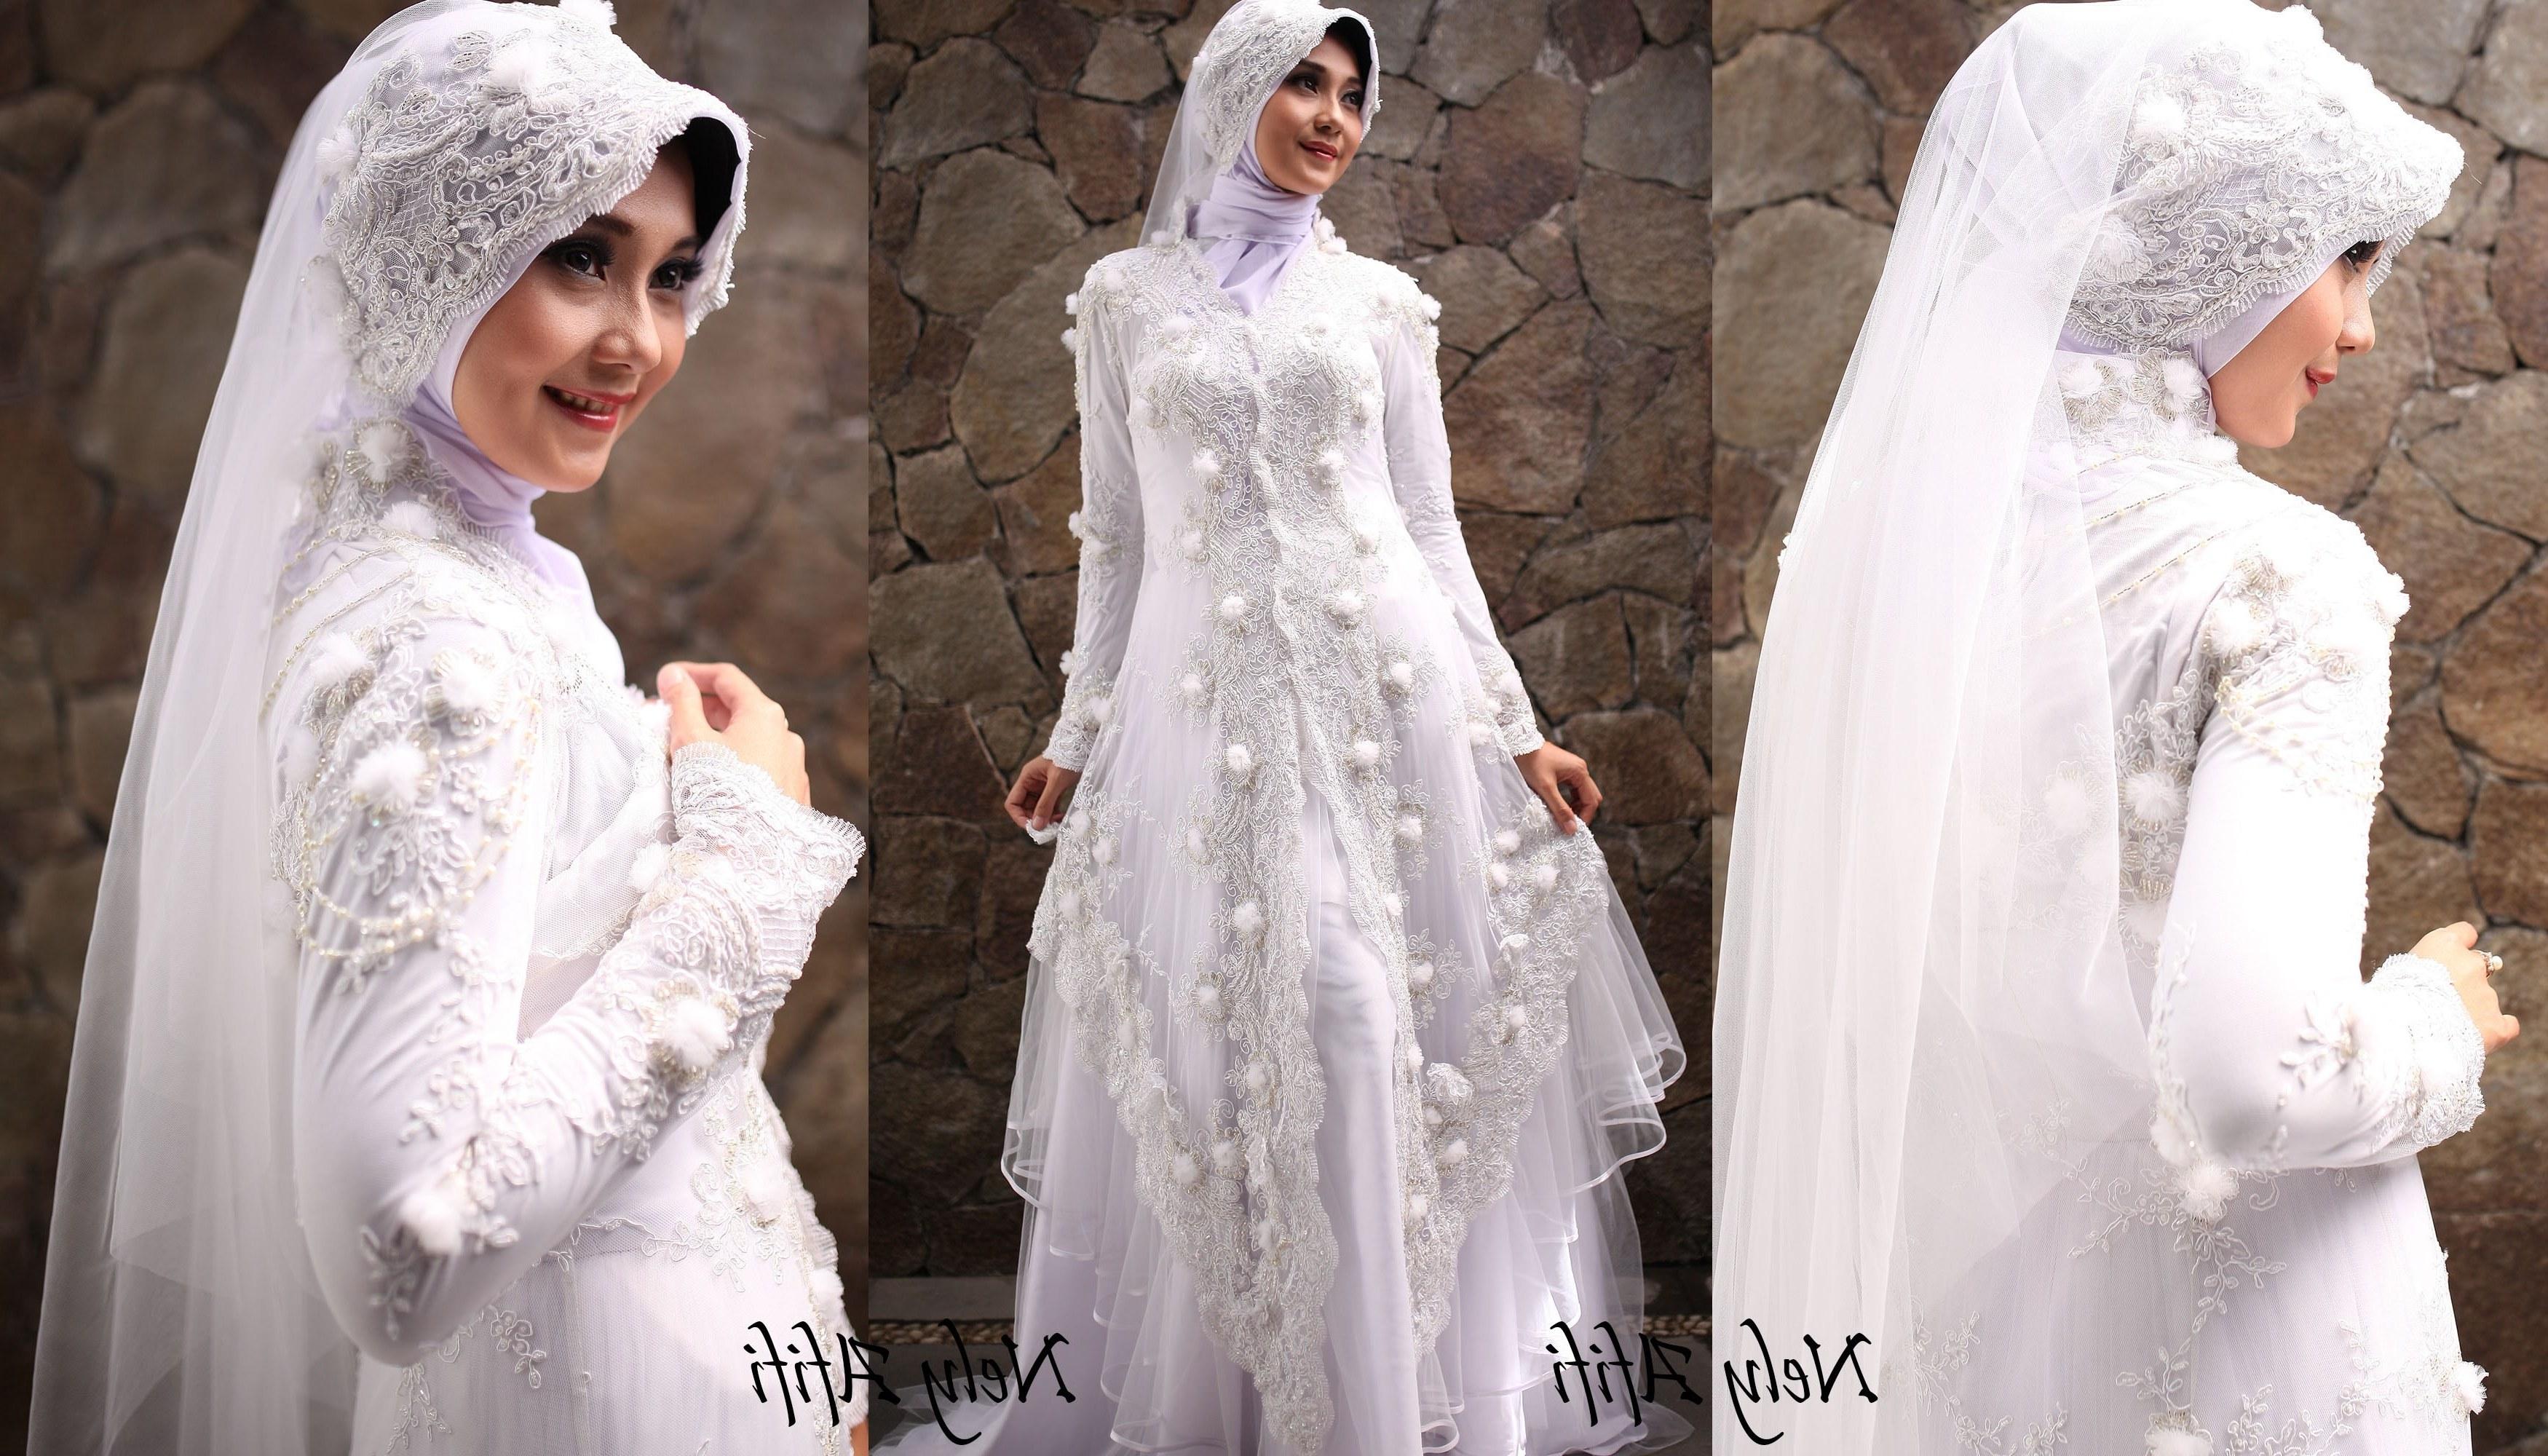 Design Gaun Pengantin Muslim Cantik 9fdy Foto Wanita Bercadar Modern Cantik Gaun Pengantin Muslimah